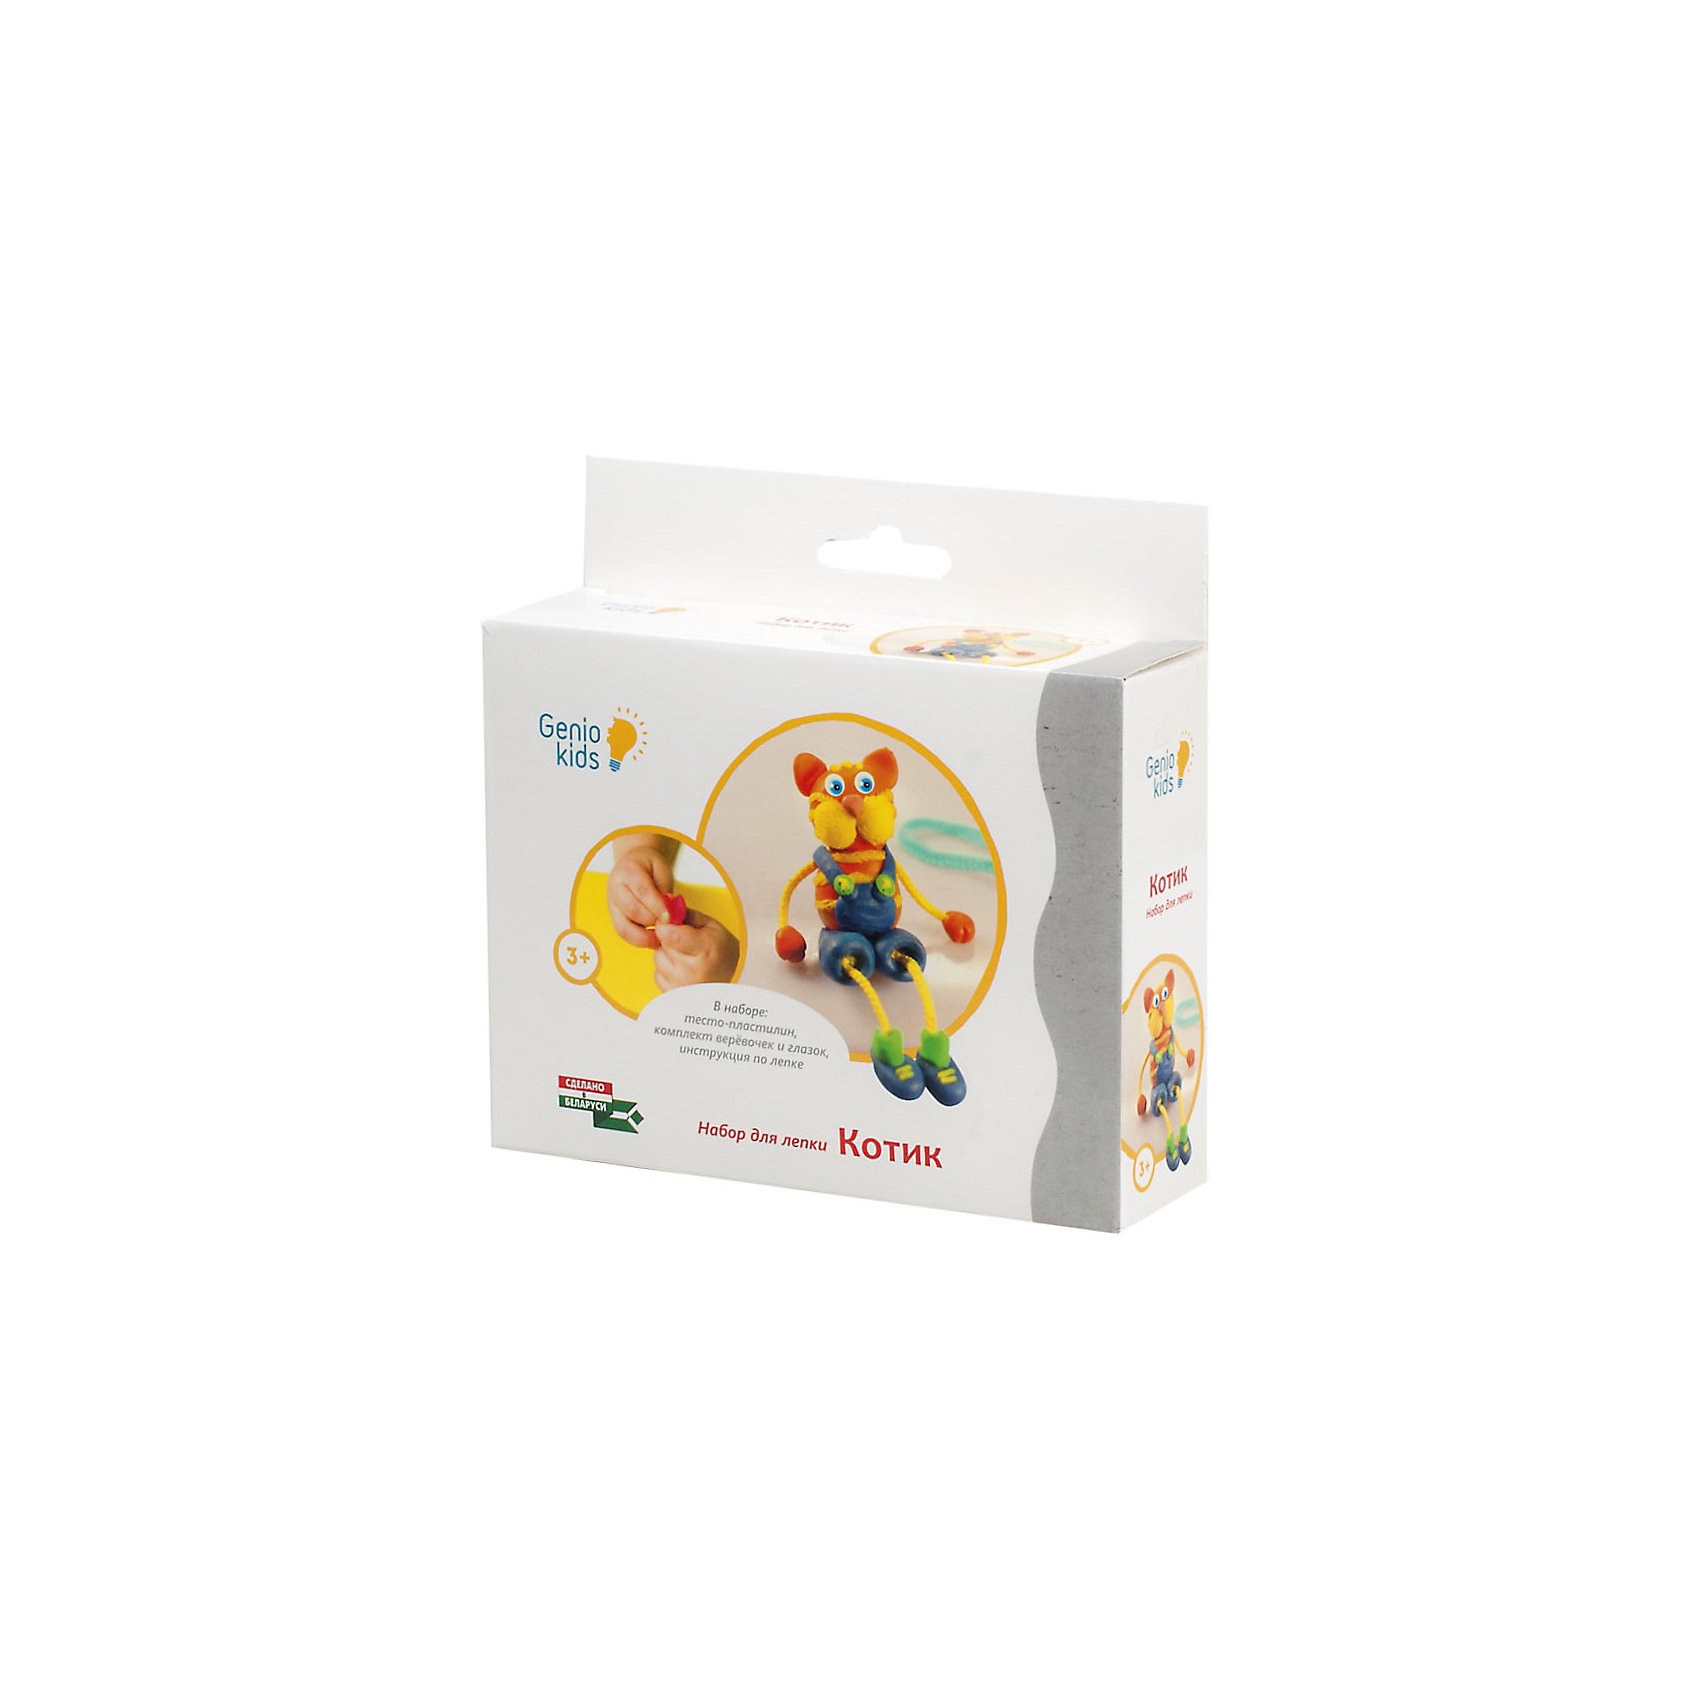 "Genio Kids Набор для детского творчества Котик genio kids набор для детского творчества ""шкатулка"""